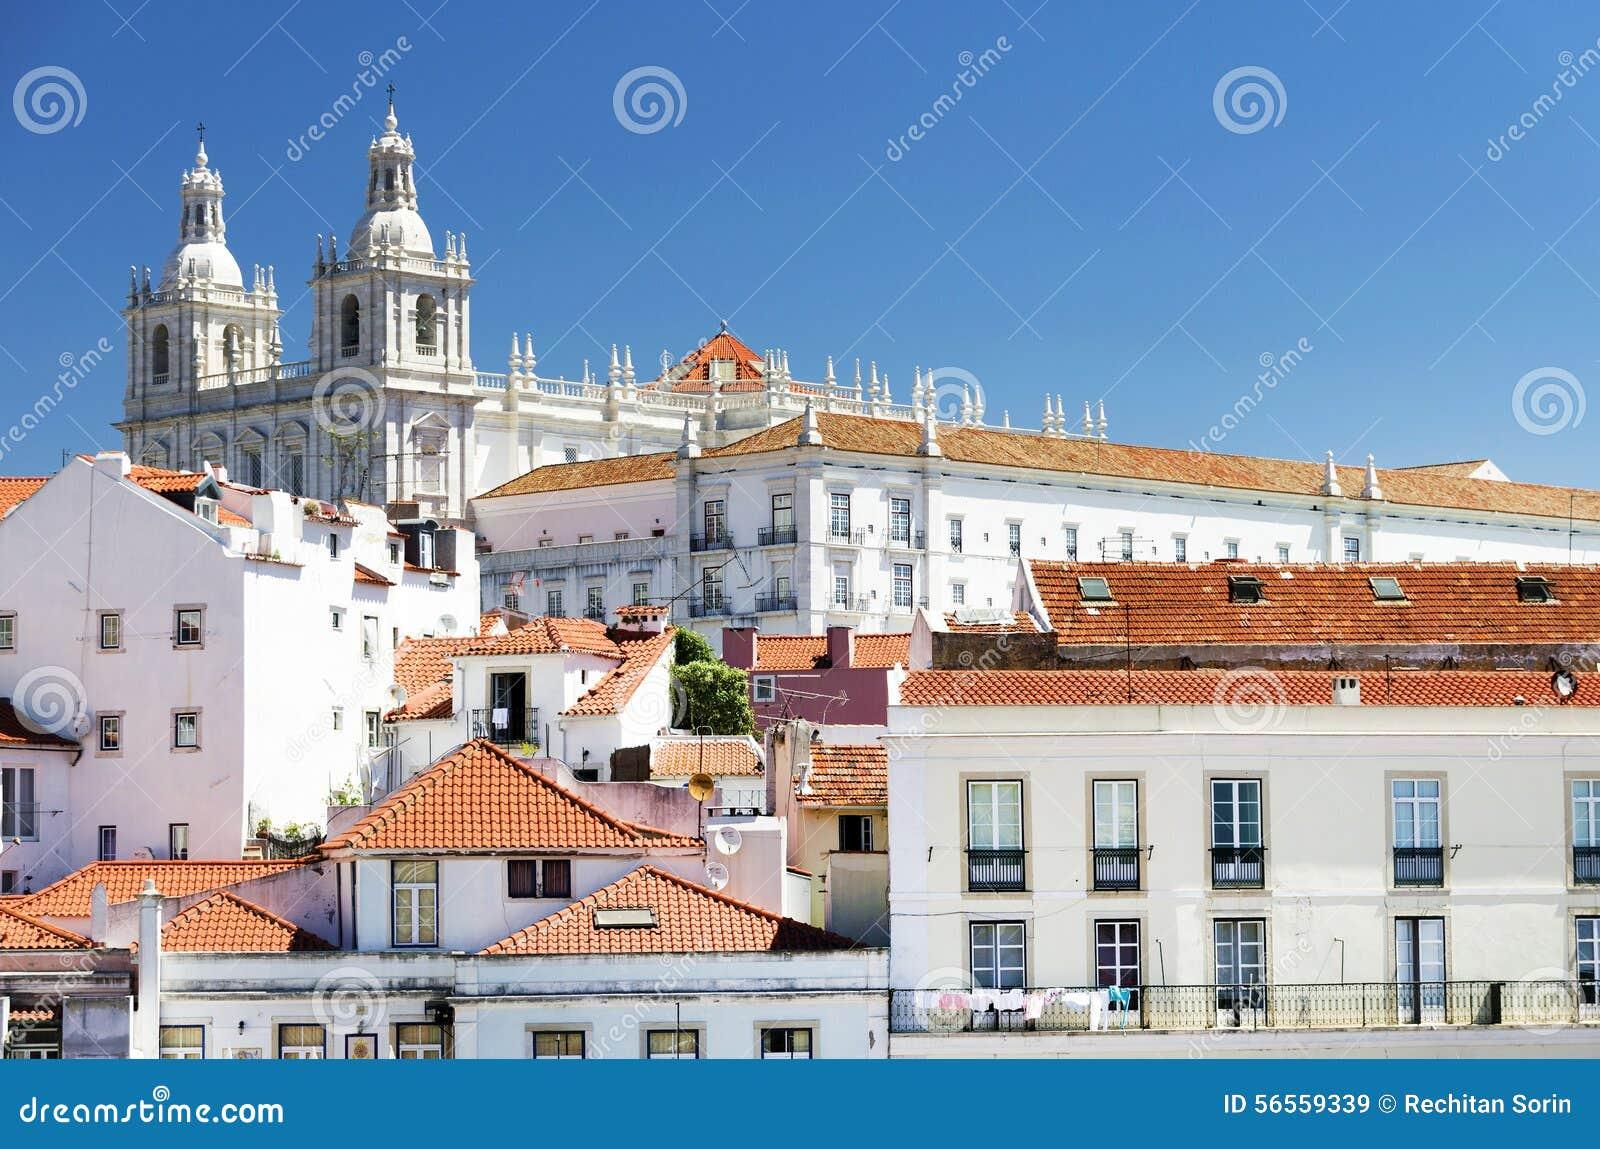 Download Αρχιτεκτονική λεπτομέρεια στη Λισσαβώνα Στοκ Εικόνα - εικόνα από ορίζοντας, ευρωπαϊκά: 56559339